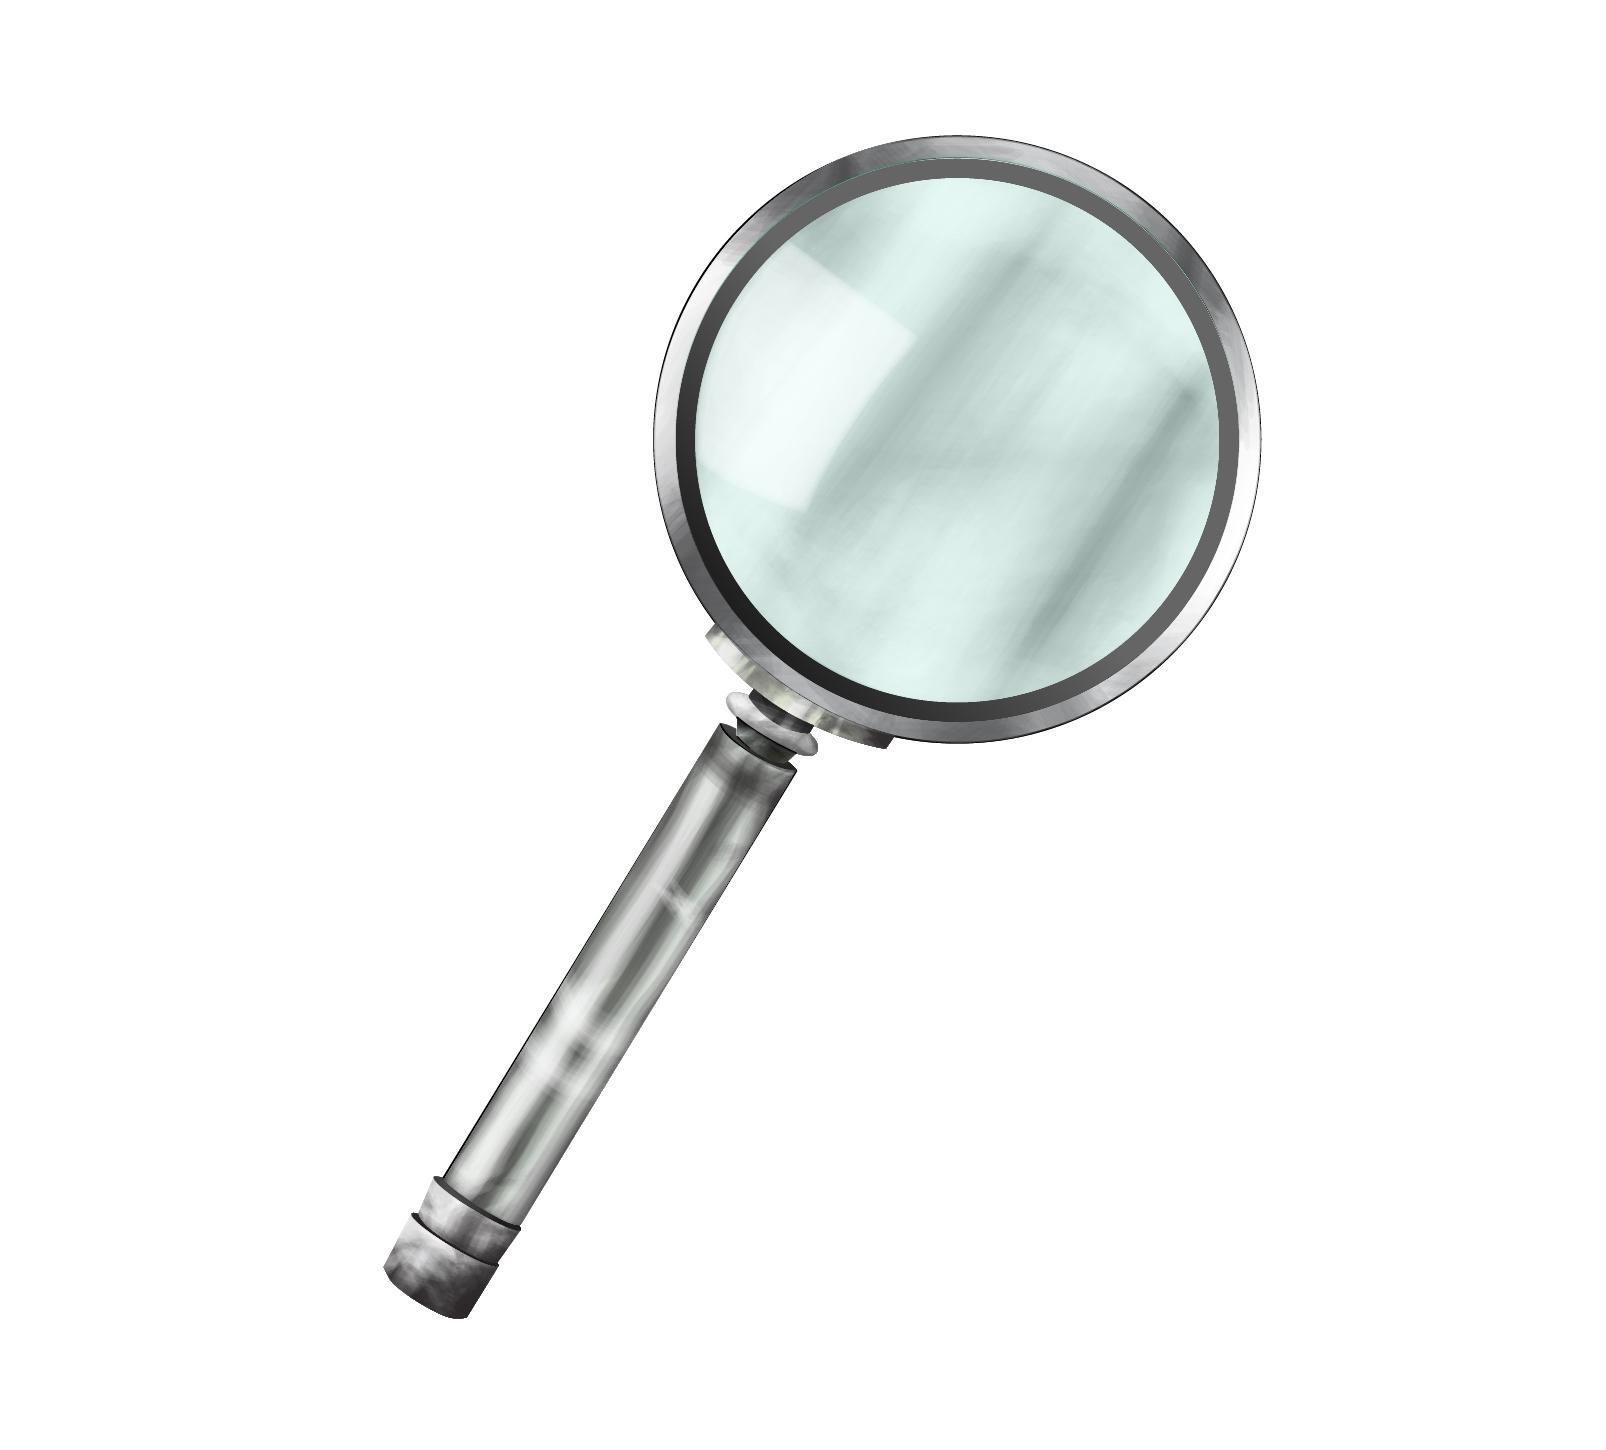 magnifying glass2-01.jpg